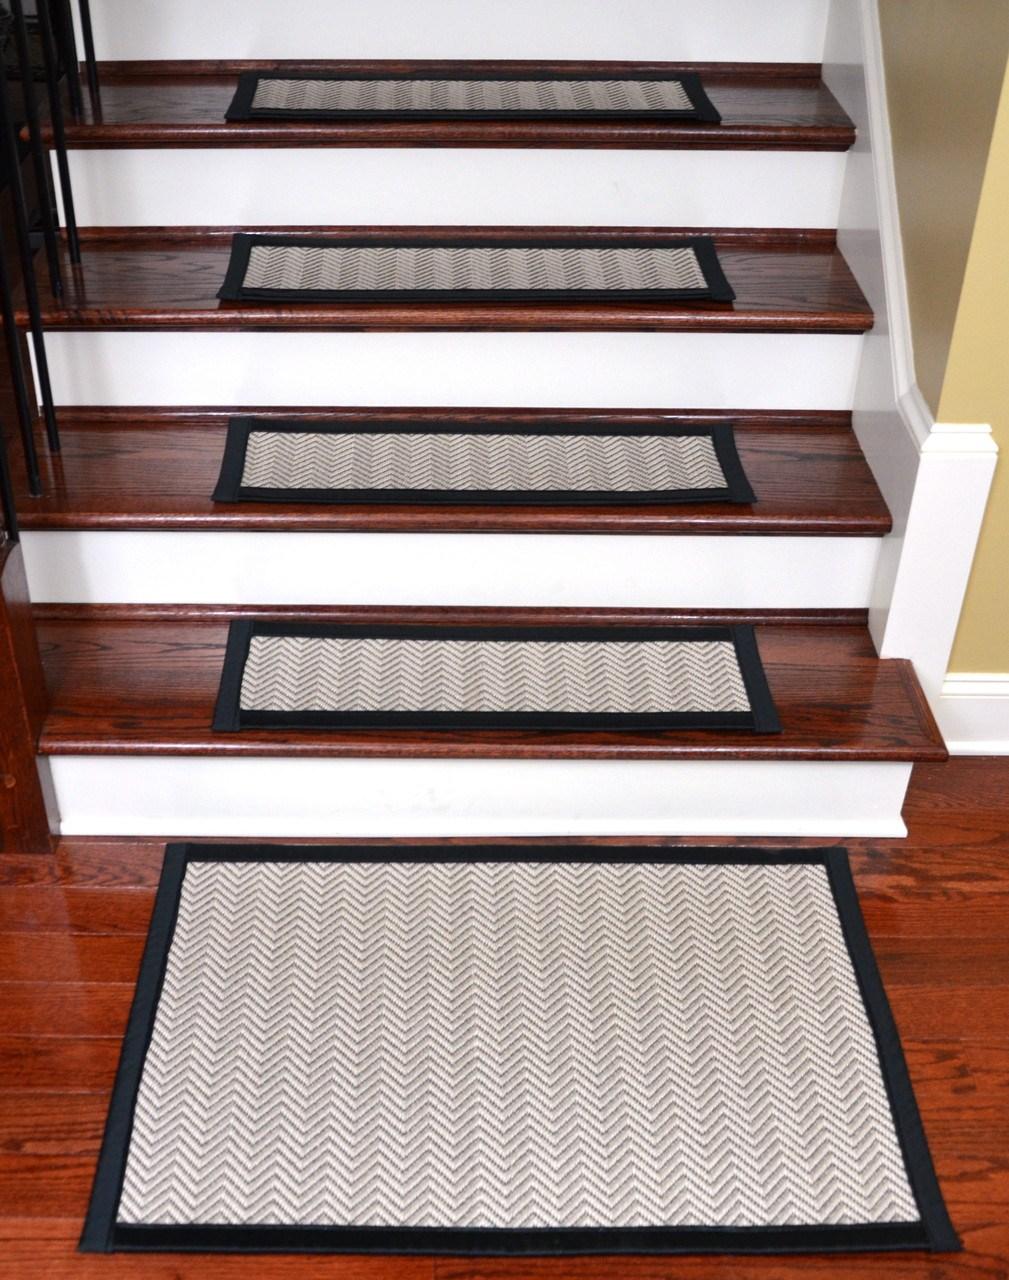 Hatteras Flatweave Stair Treads Tape Free 15 Pk | Dean Flooring Stair Treads | Fiber Sisal | Bullnose Wraparound | Stick Bullnose | Sisal Carpet | Washable Non